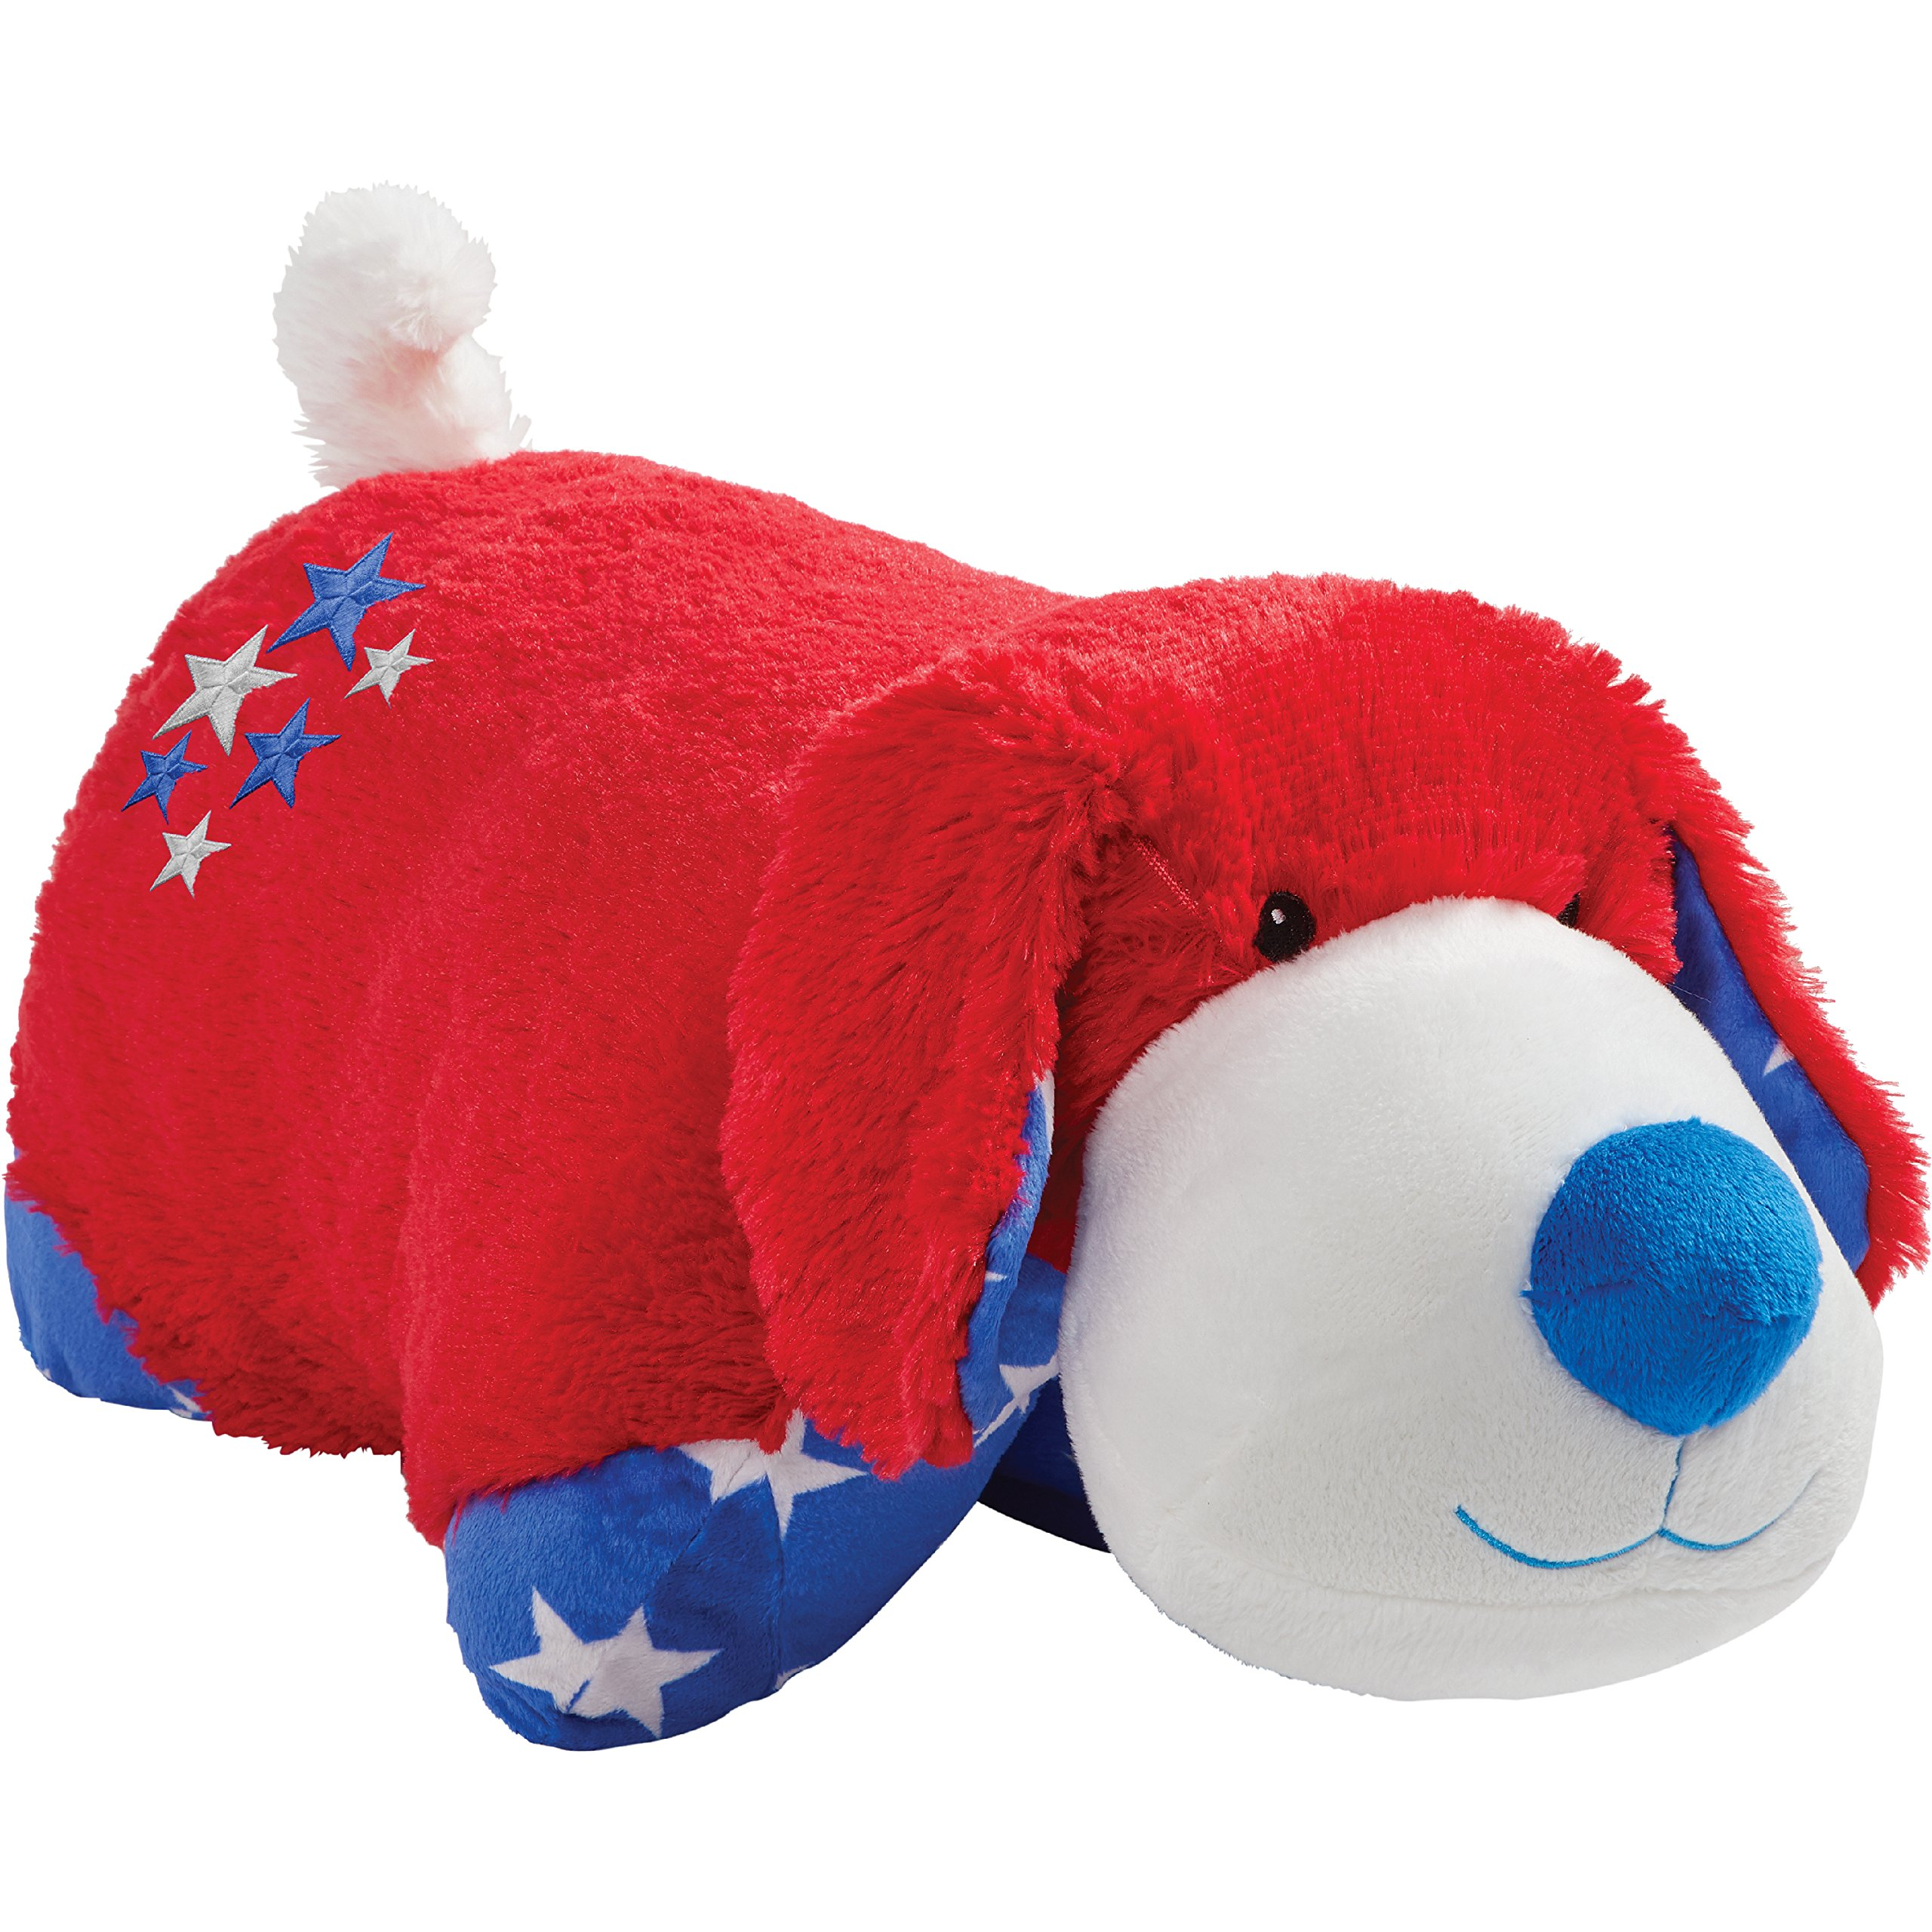 Pillow Pets Americana Red Puppy, Stuffed Animal Plush Toy 18'', Sam